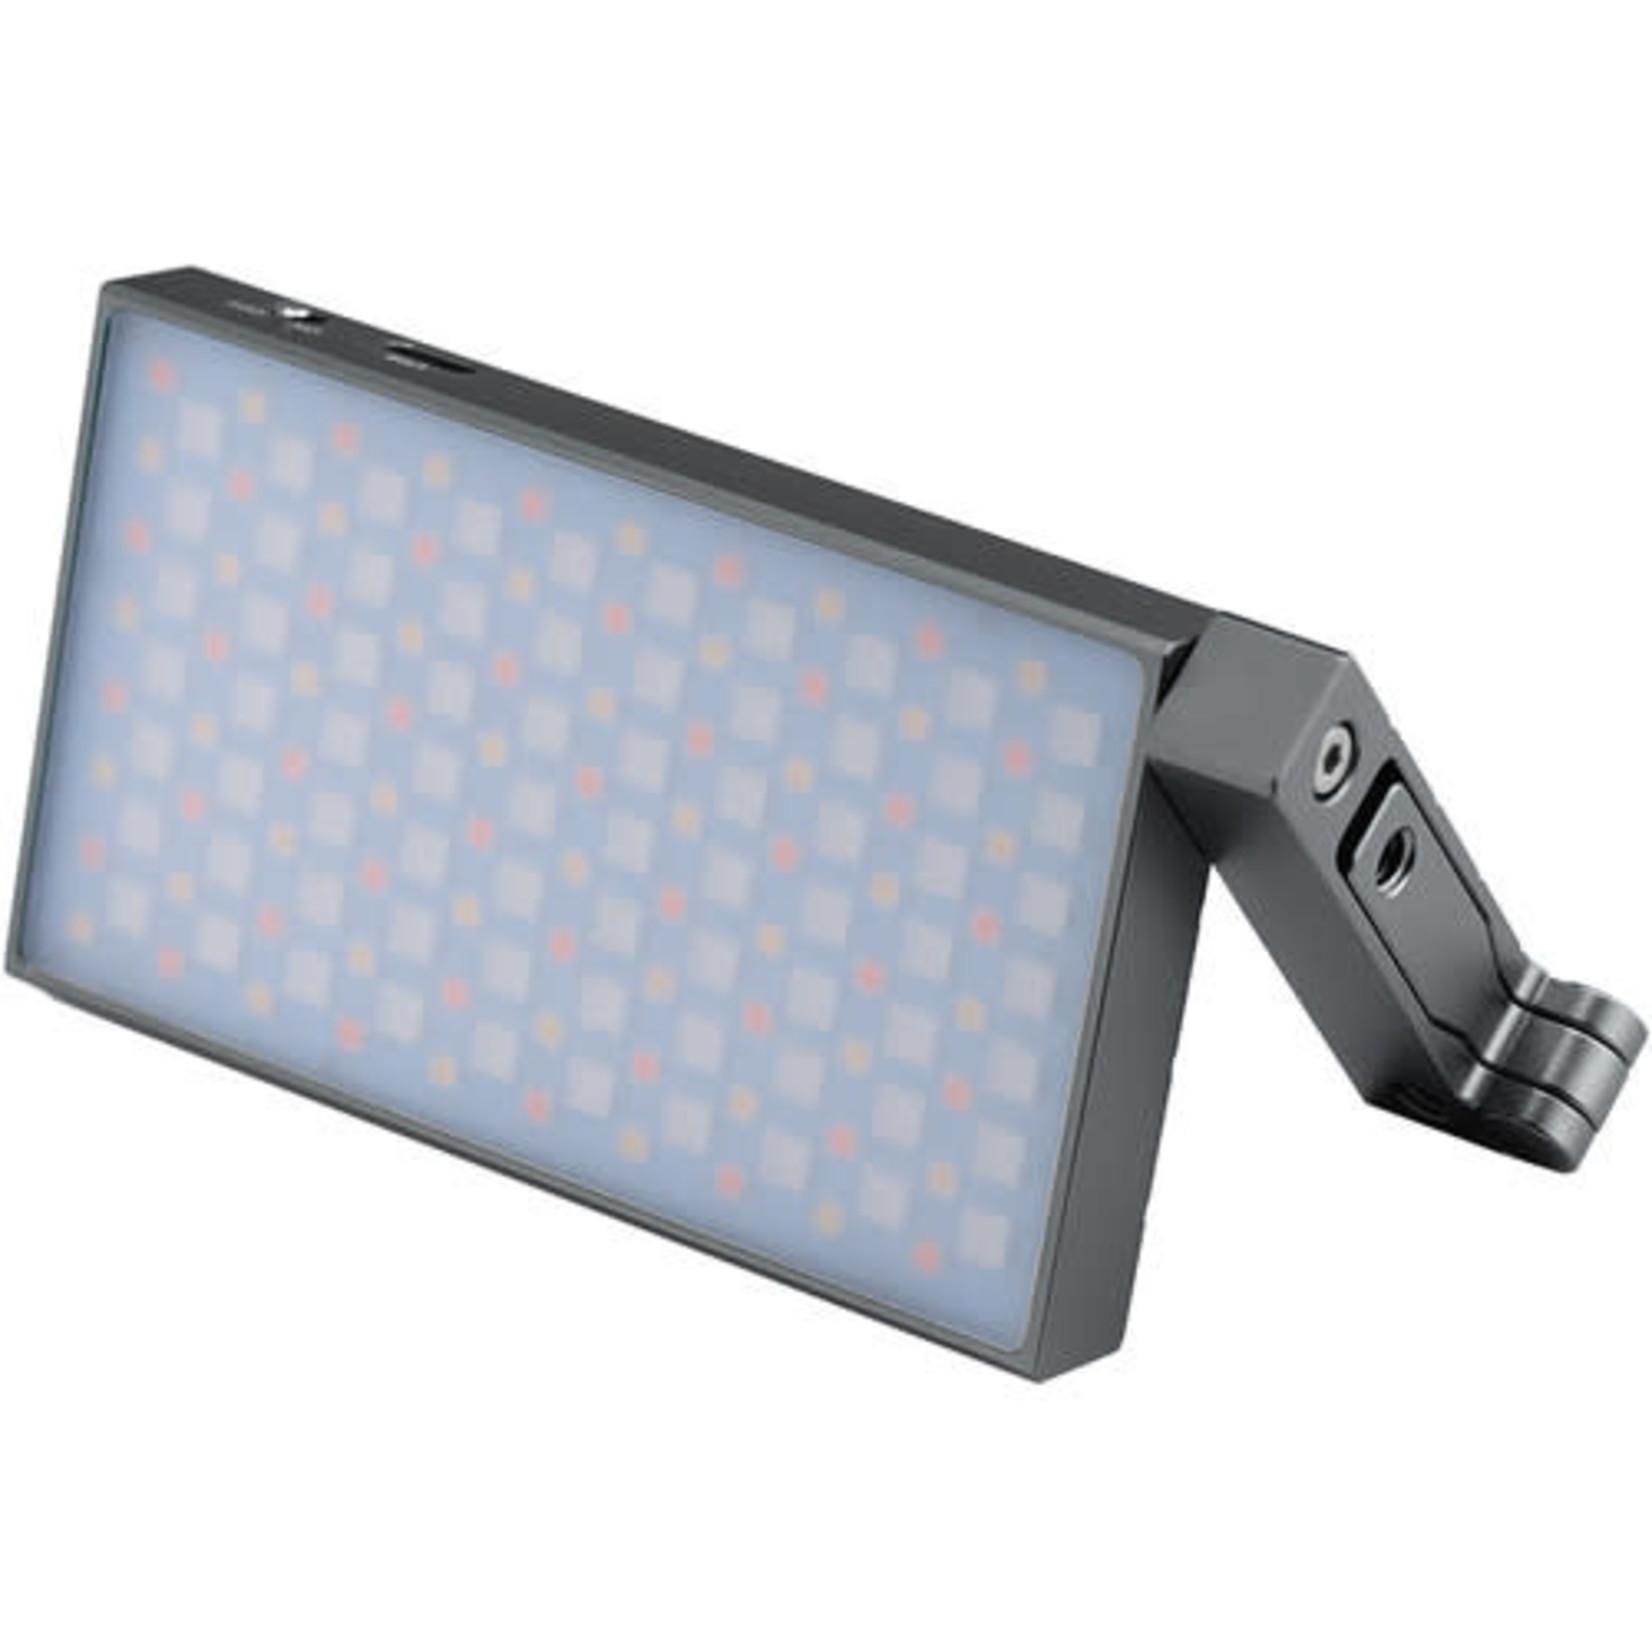 Godox Godox M1 LED Video Light